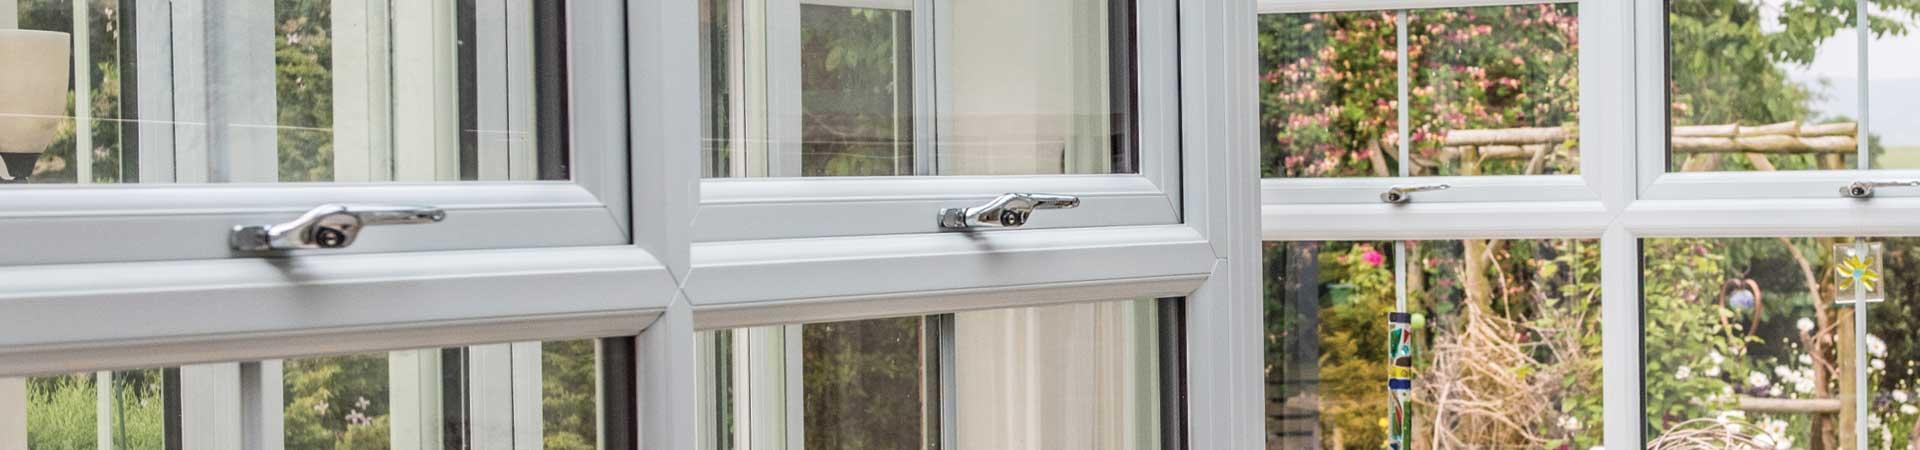 conservatory windows image